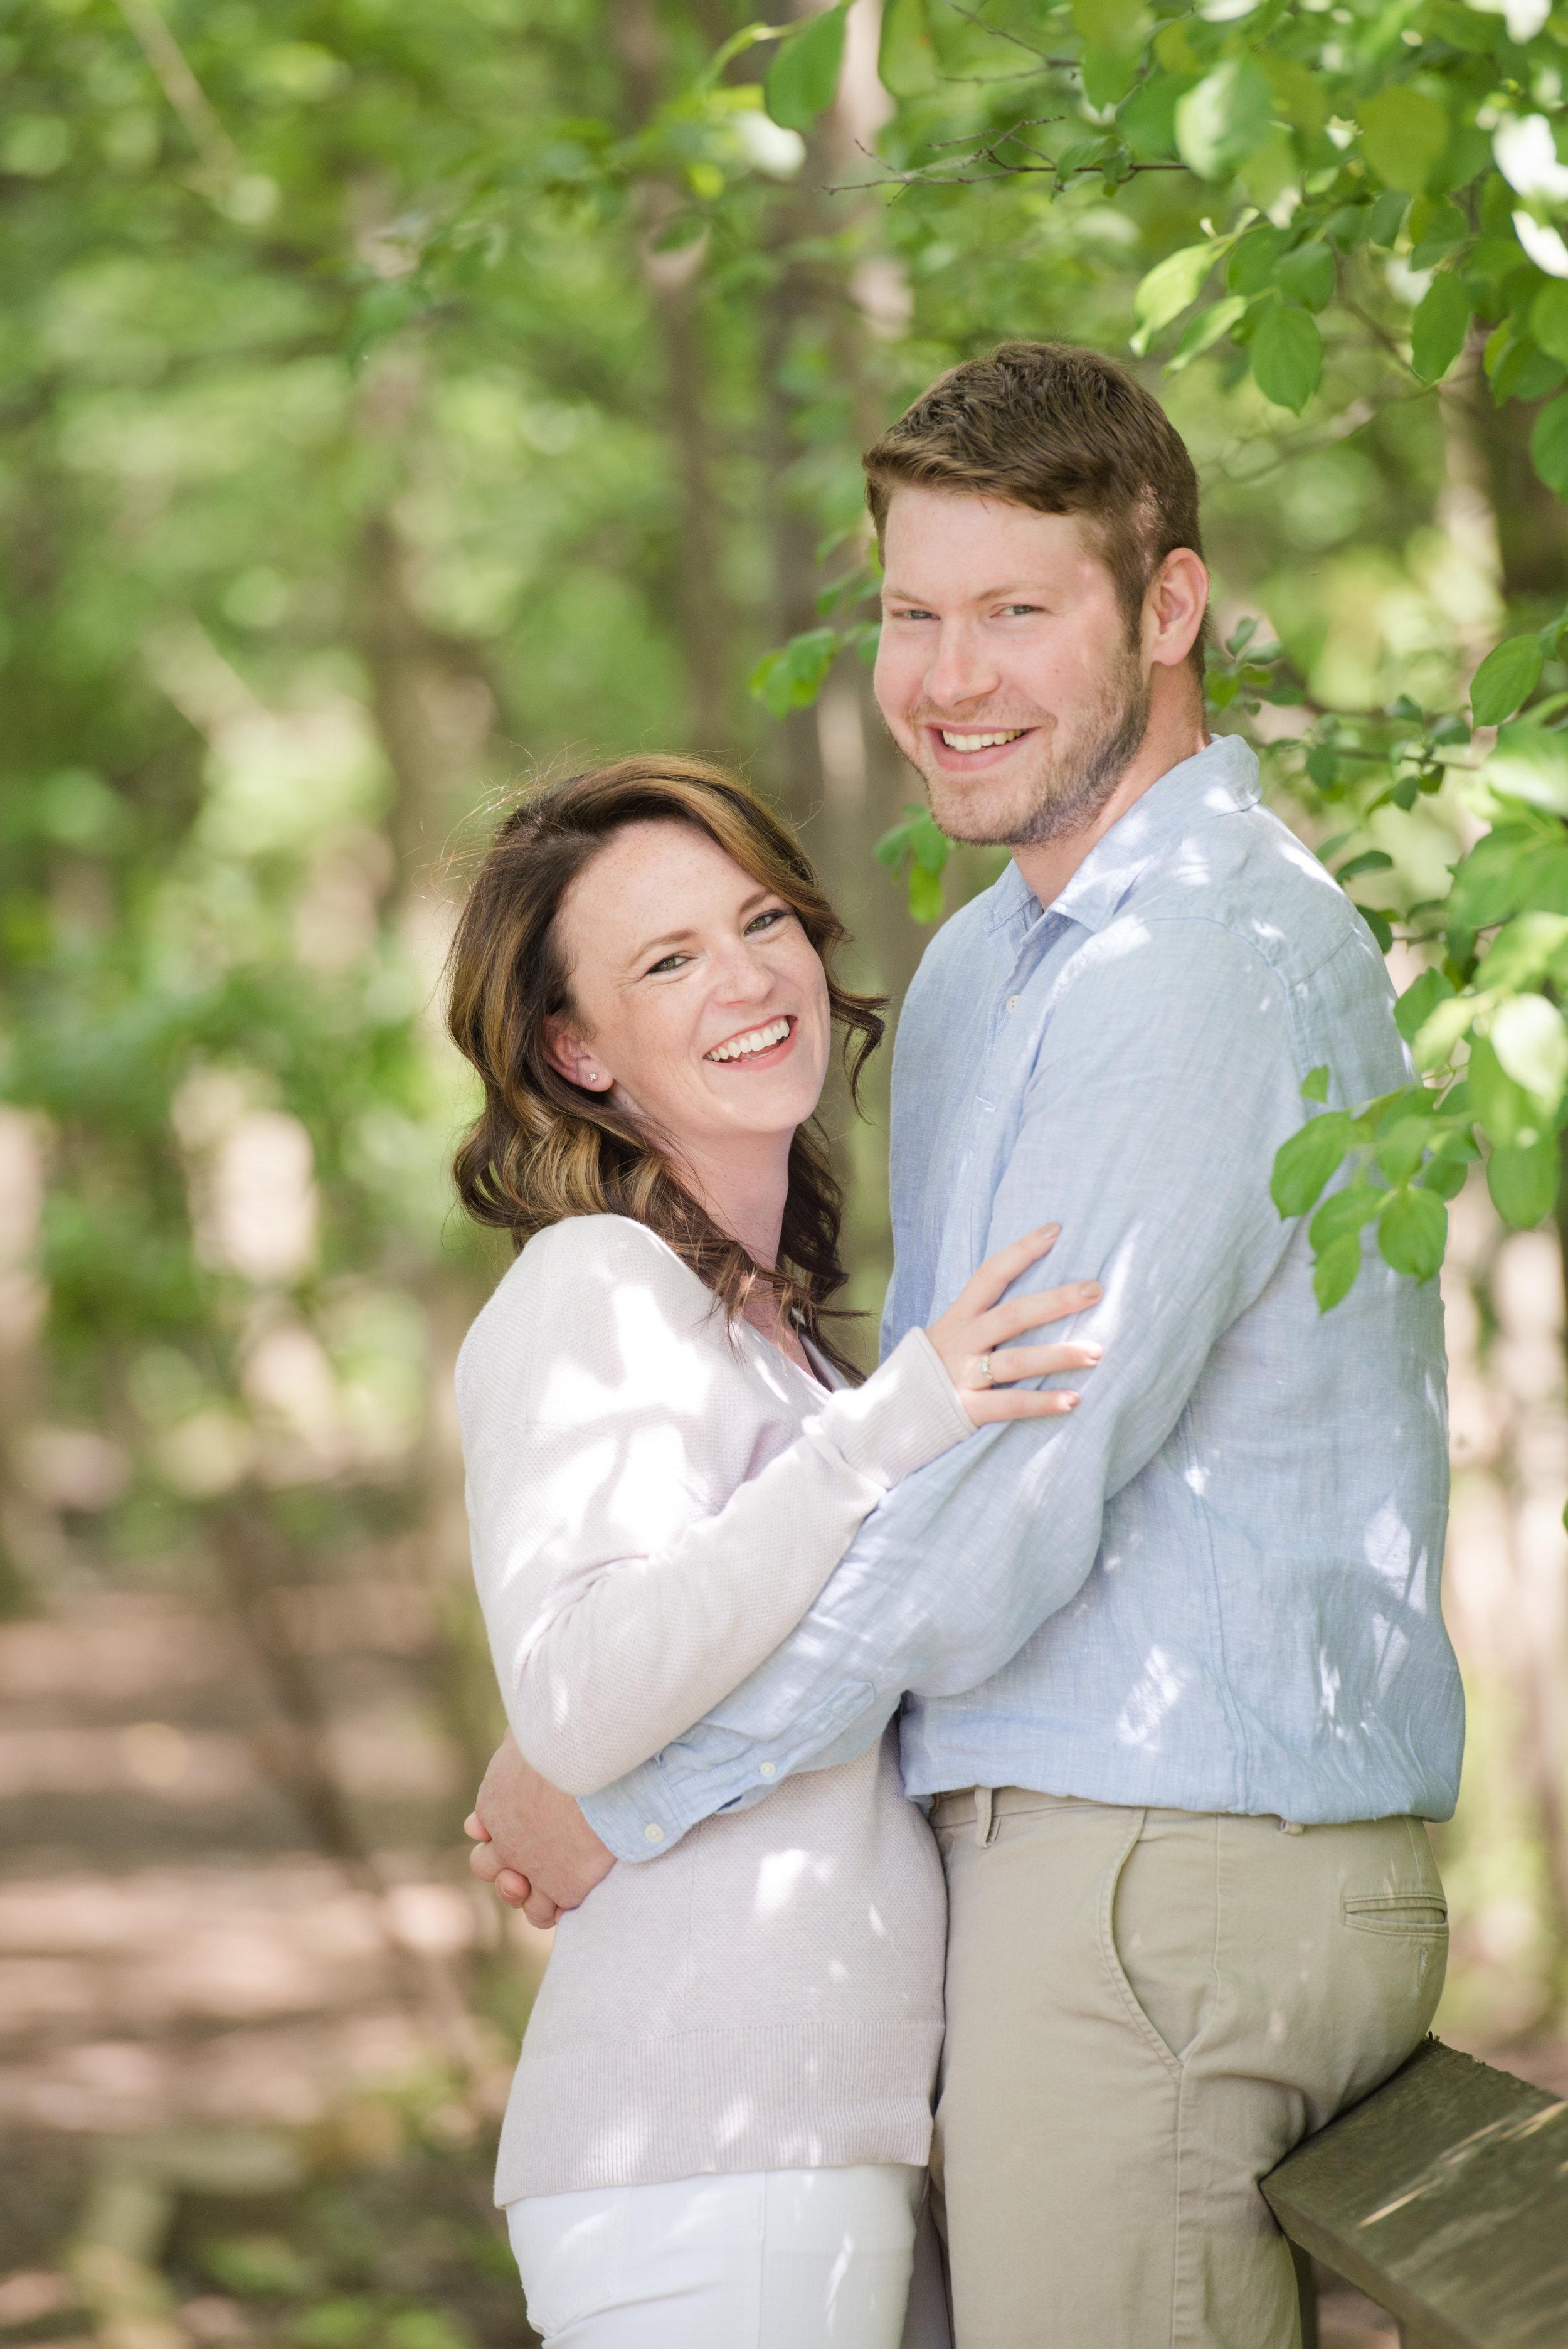 GALLERY-2019-6-9 Kaitlin, Justin & Liam Engagement 0495 55.jpg